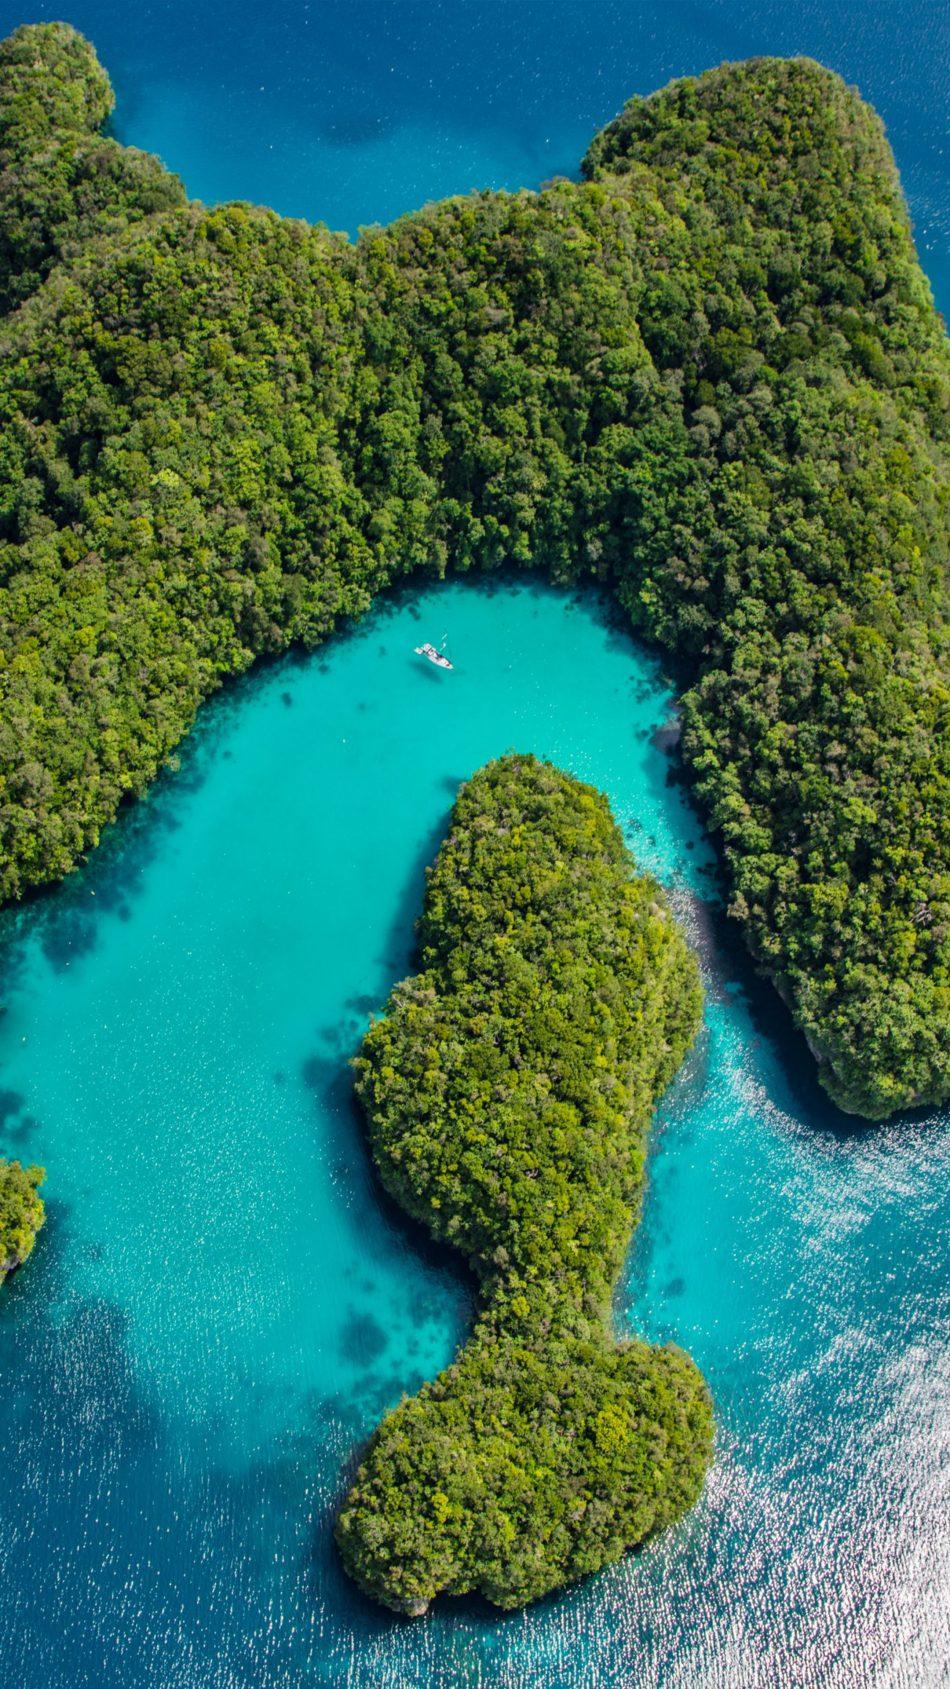 Palau Islands Philippines Ocean 4K Ultra HD Mobile Wallpaper